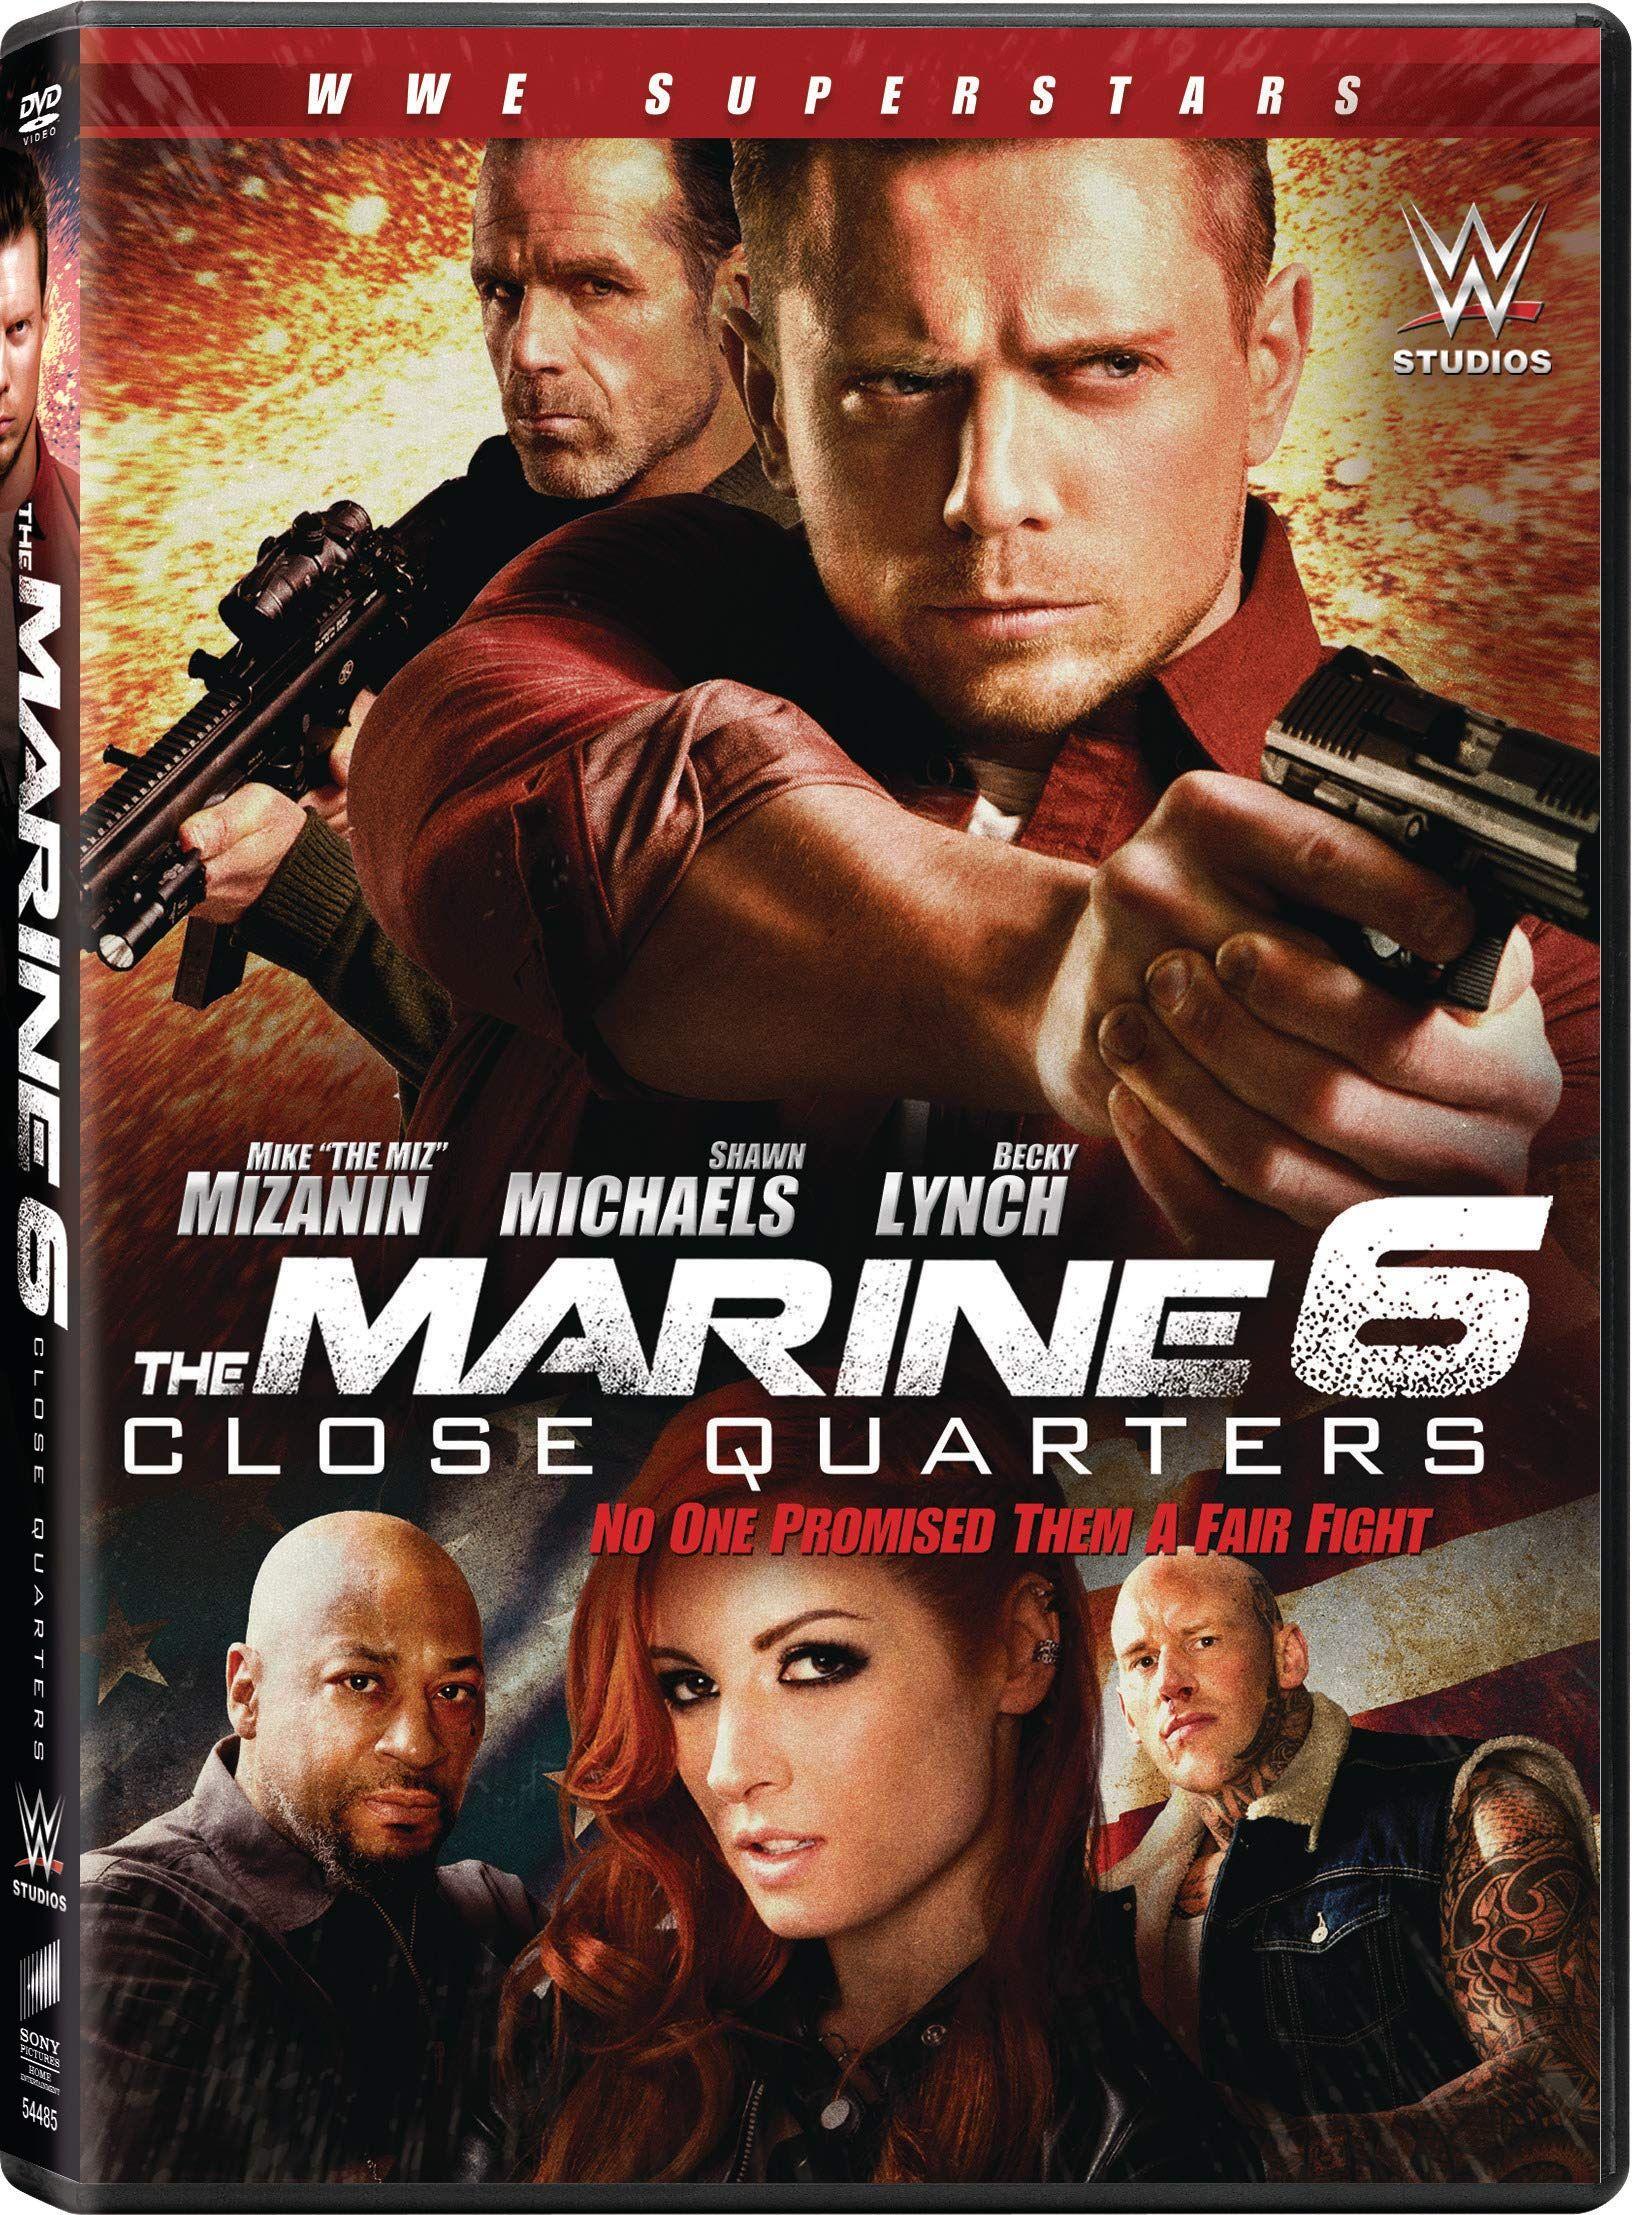 Marine 6 Close Quarters Edizione Stati Uniti Italia Dvd Quarters Edizione Mar Peliculas Completas En Castellano Ver Peliculas Gratis Películas En Inglés